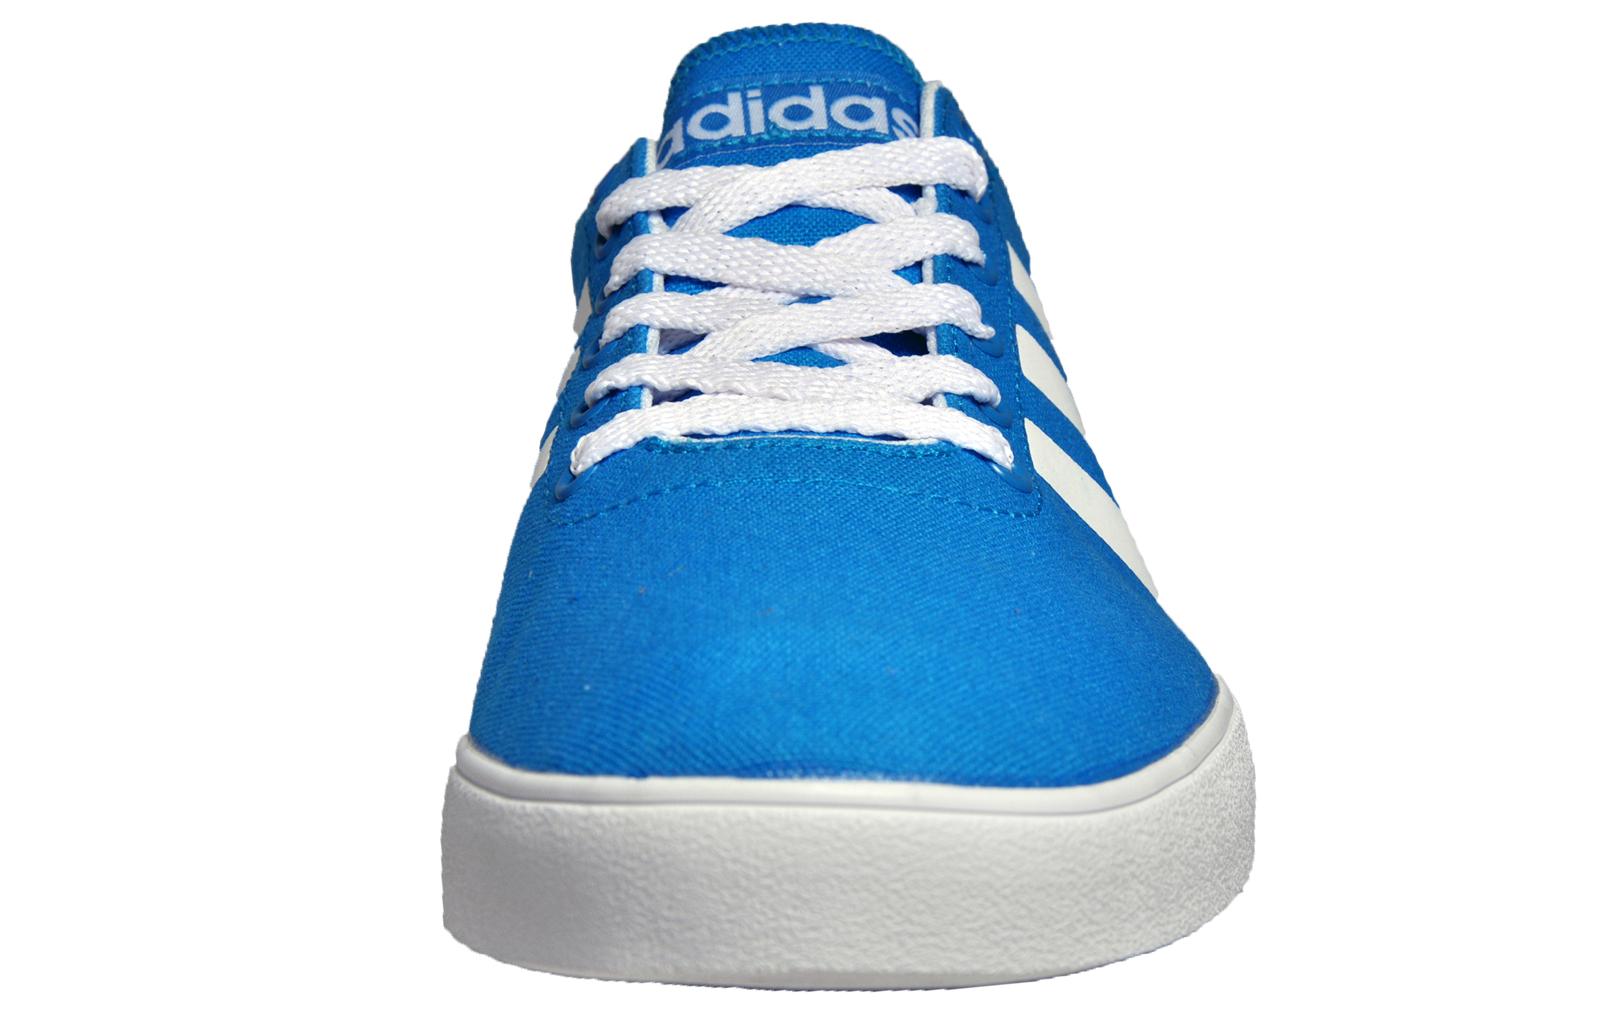 Adidas Neo Easy Vulc VS Mens Classic Casual Retro